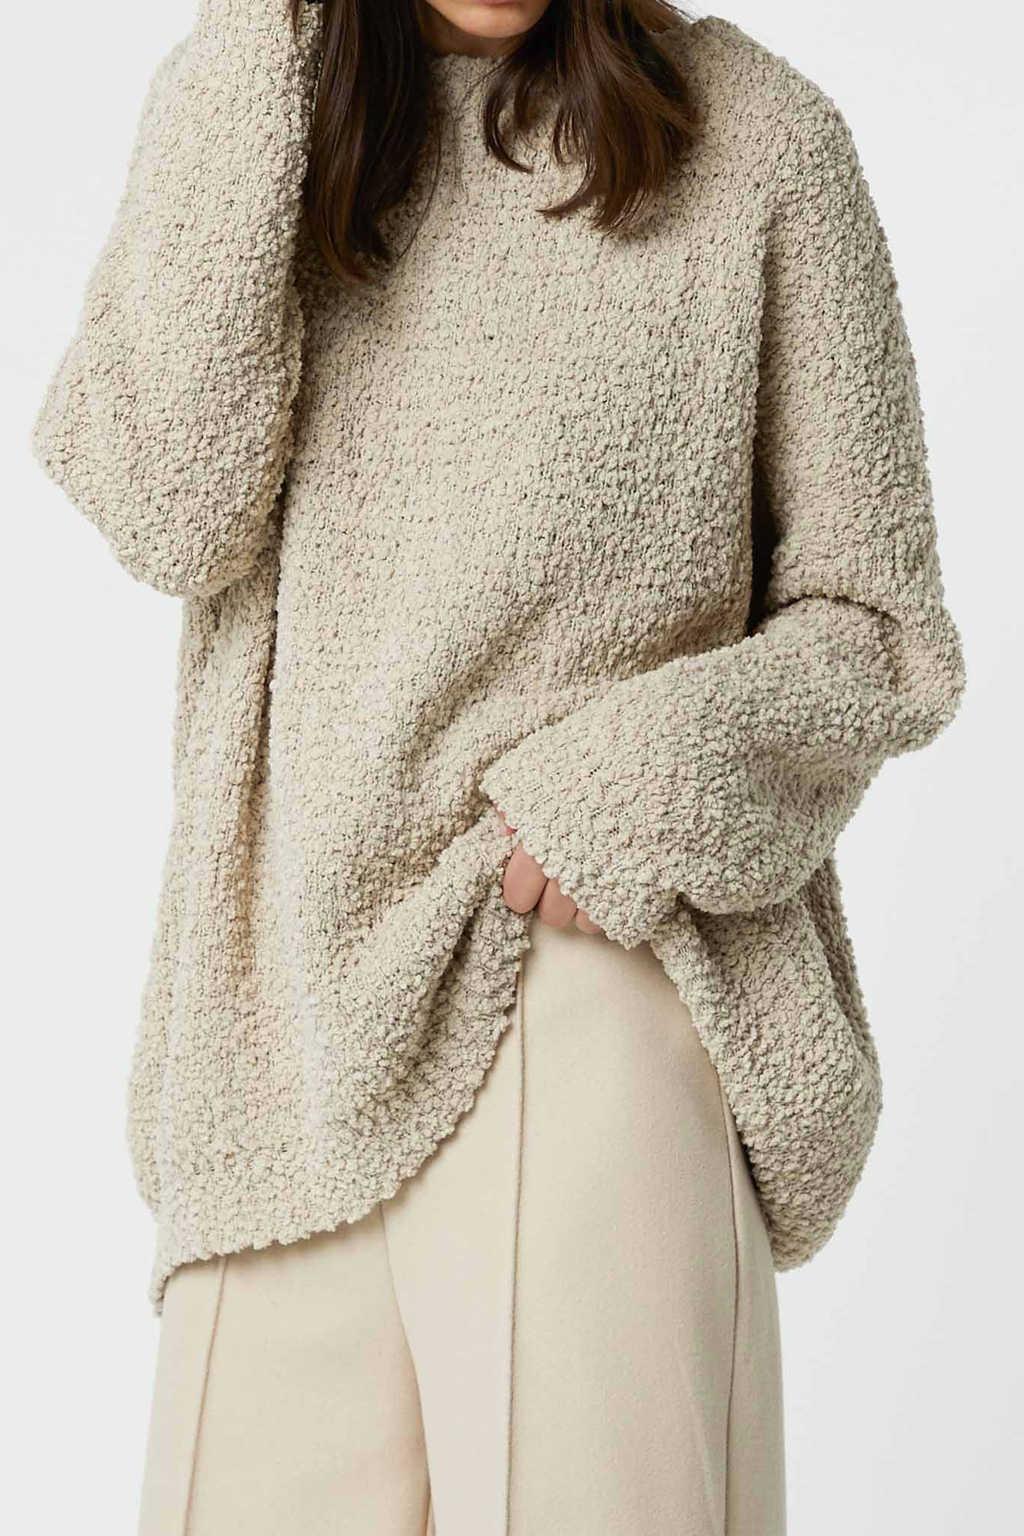 Sweater 3082 Oatmeal 4